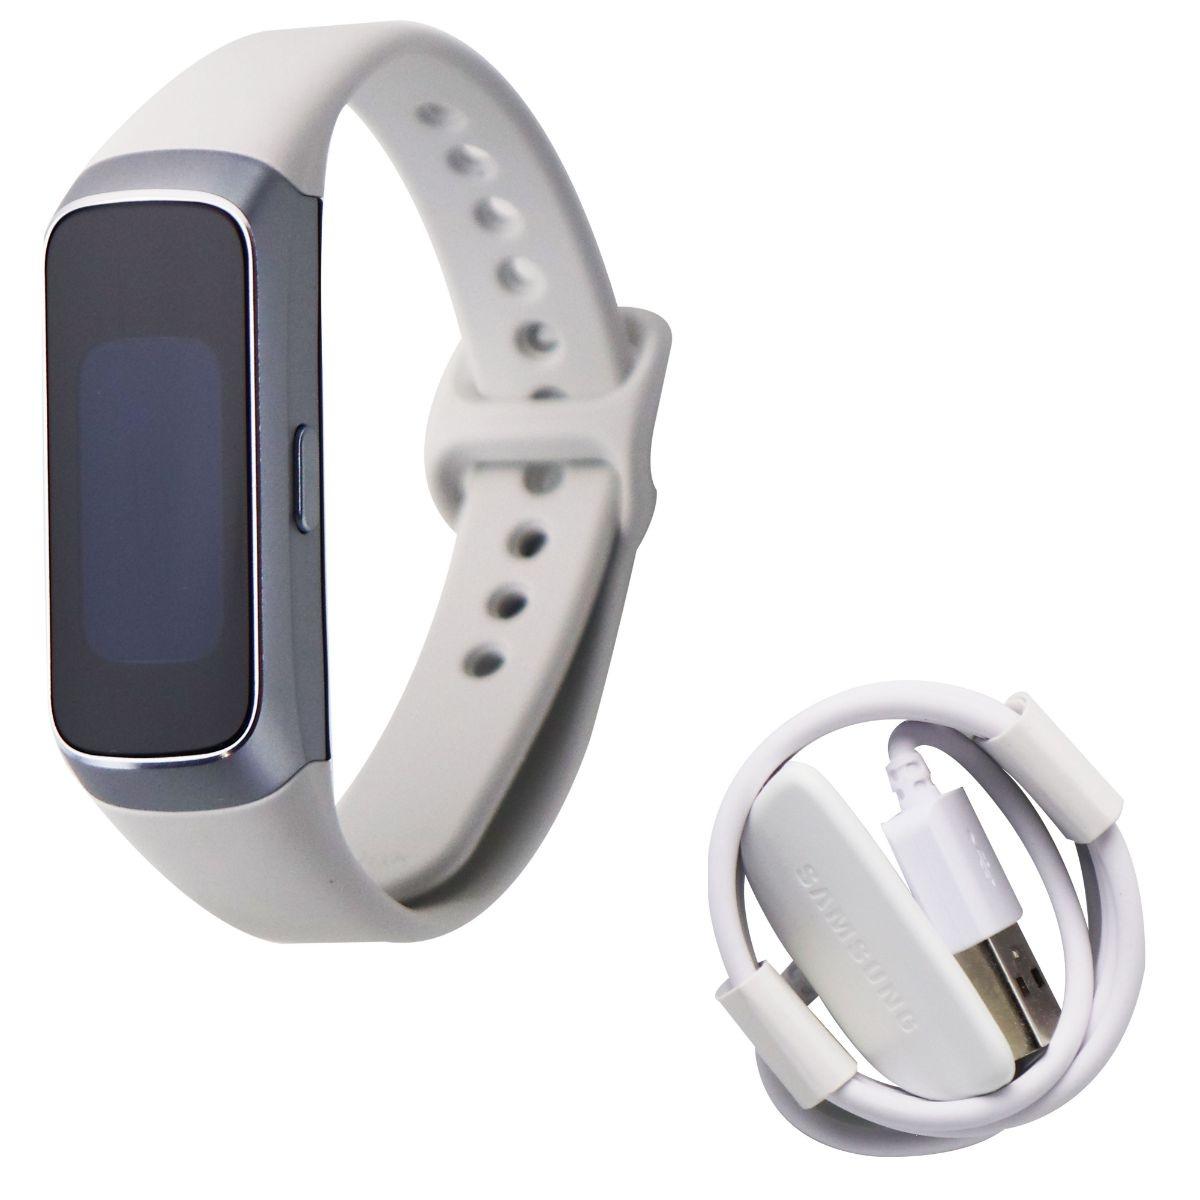 Samsung Galaxy Fit Bluetooth Fitness Tracker - Silver SM-R370NZSAXAR (US)